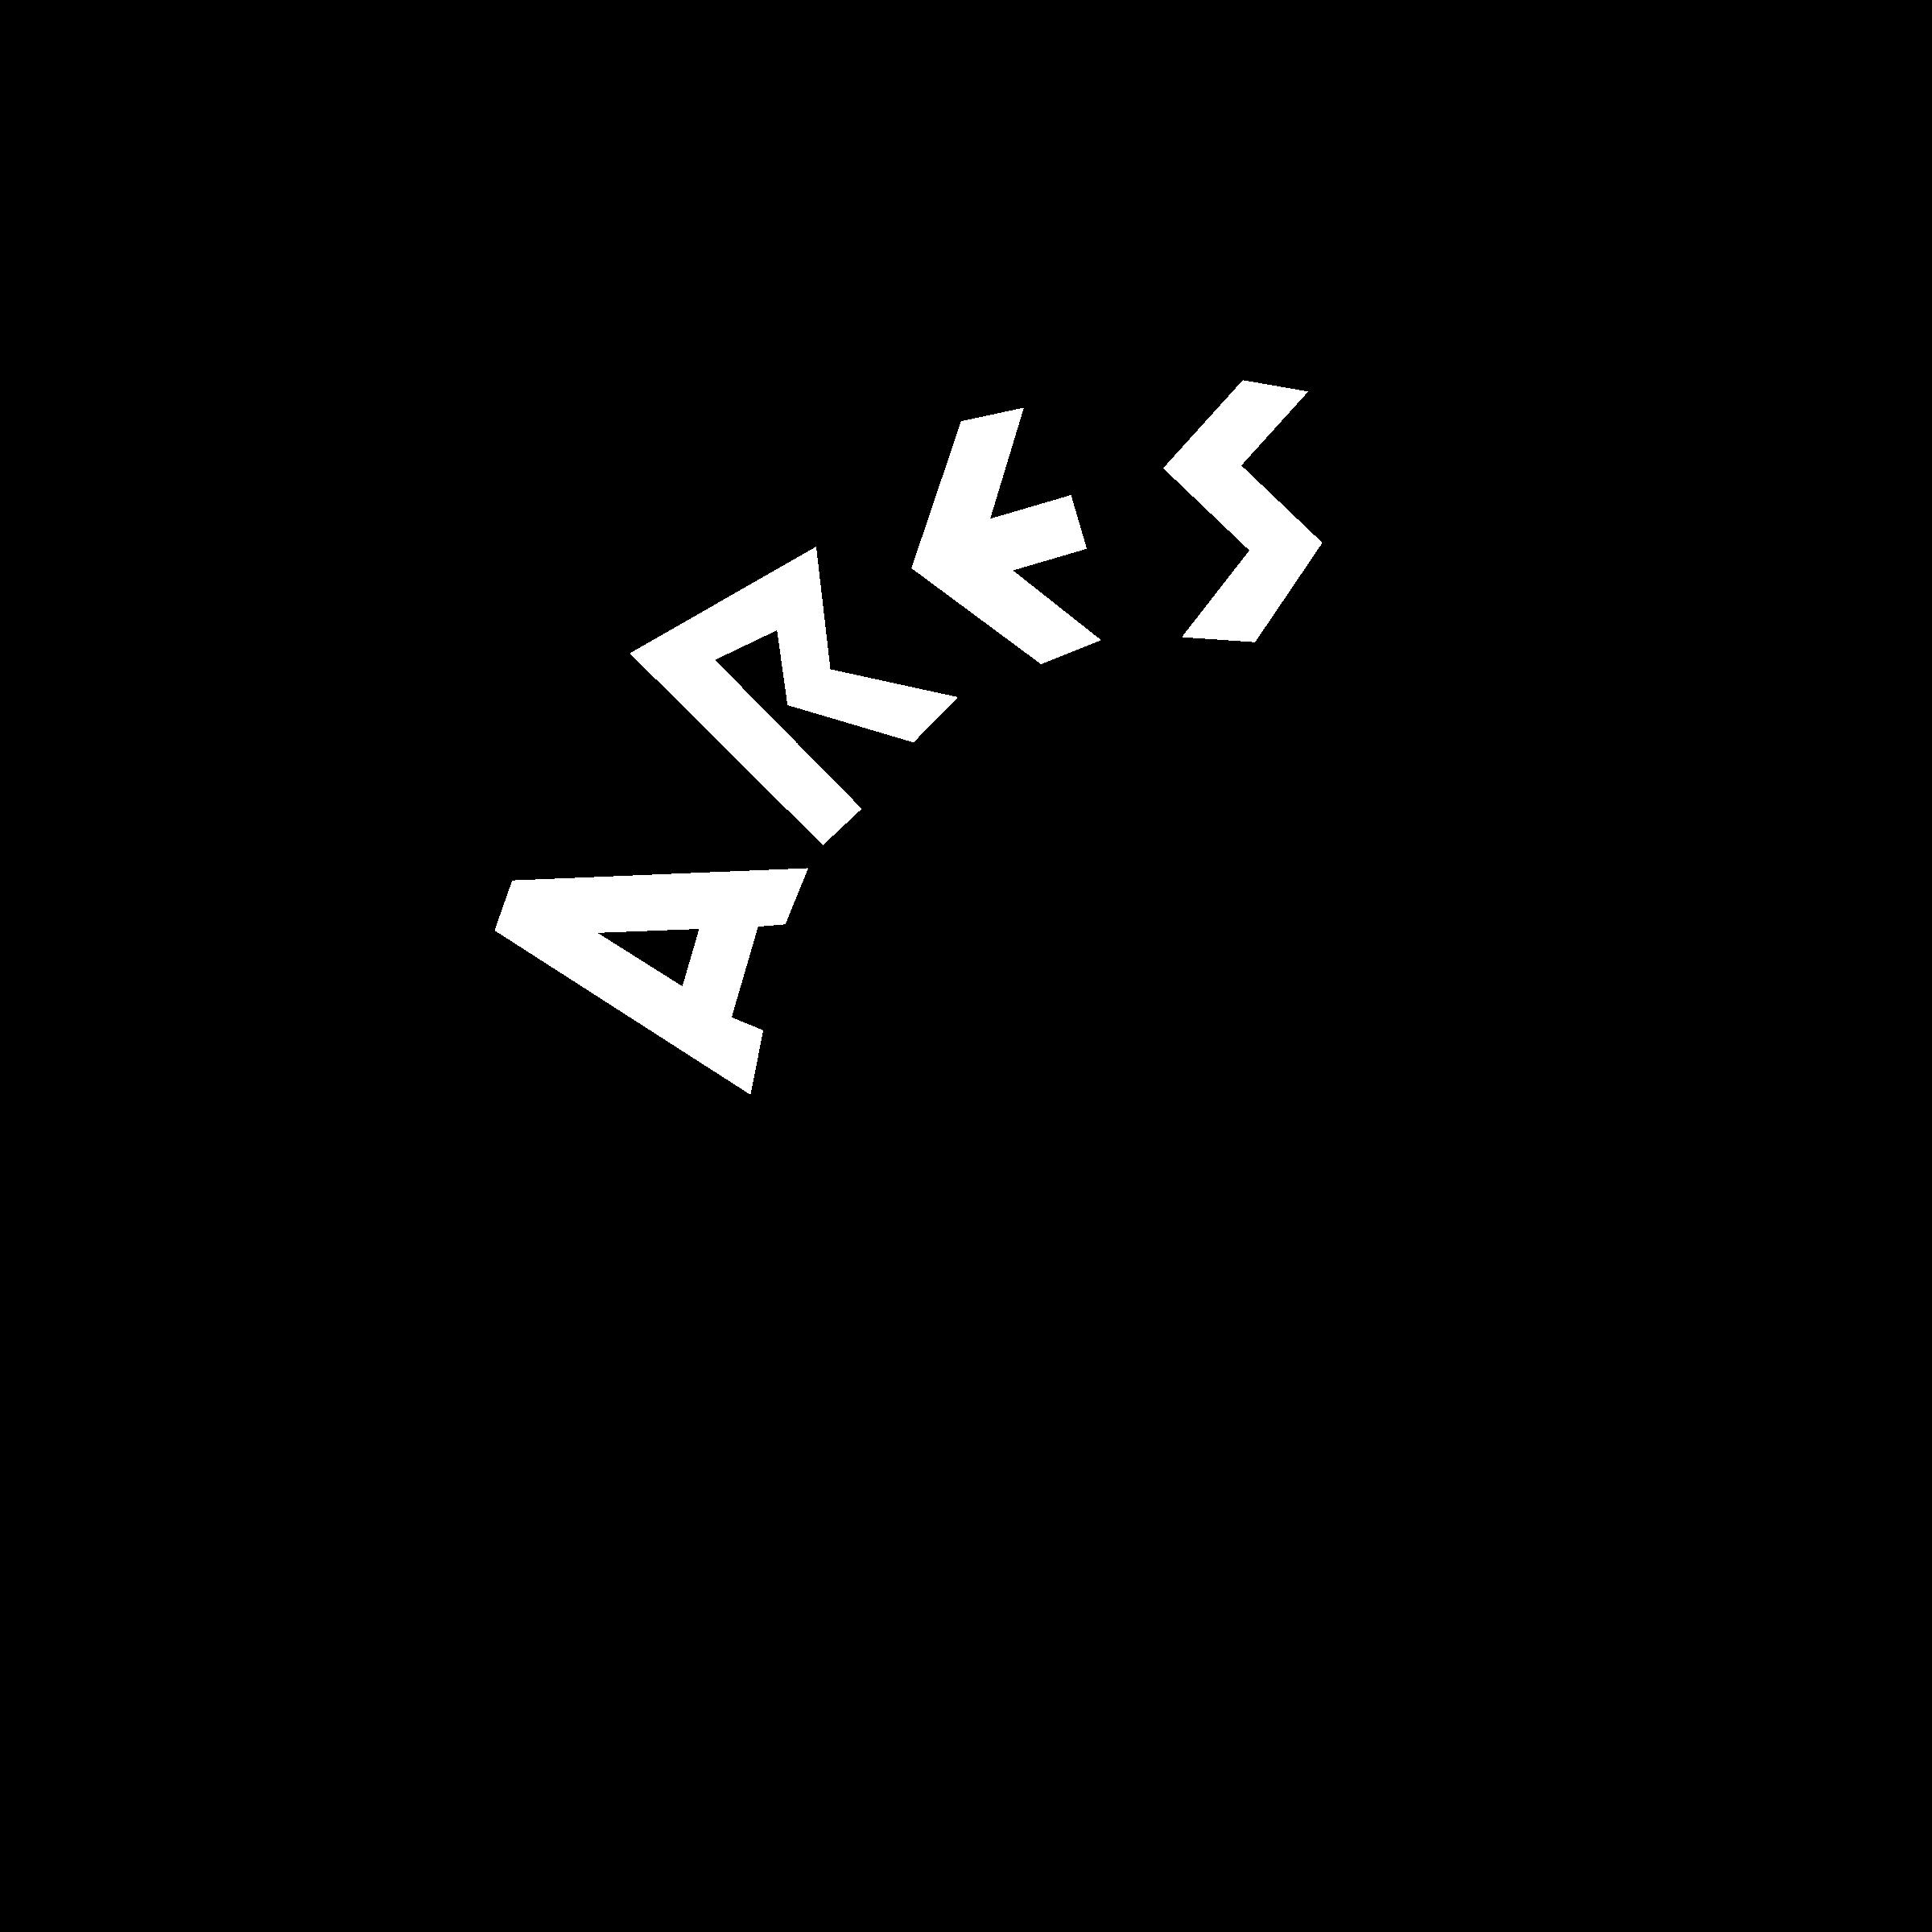 Ares 01 Logo PNG Transparent & SVG Vector.